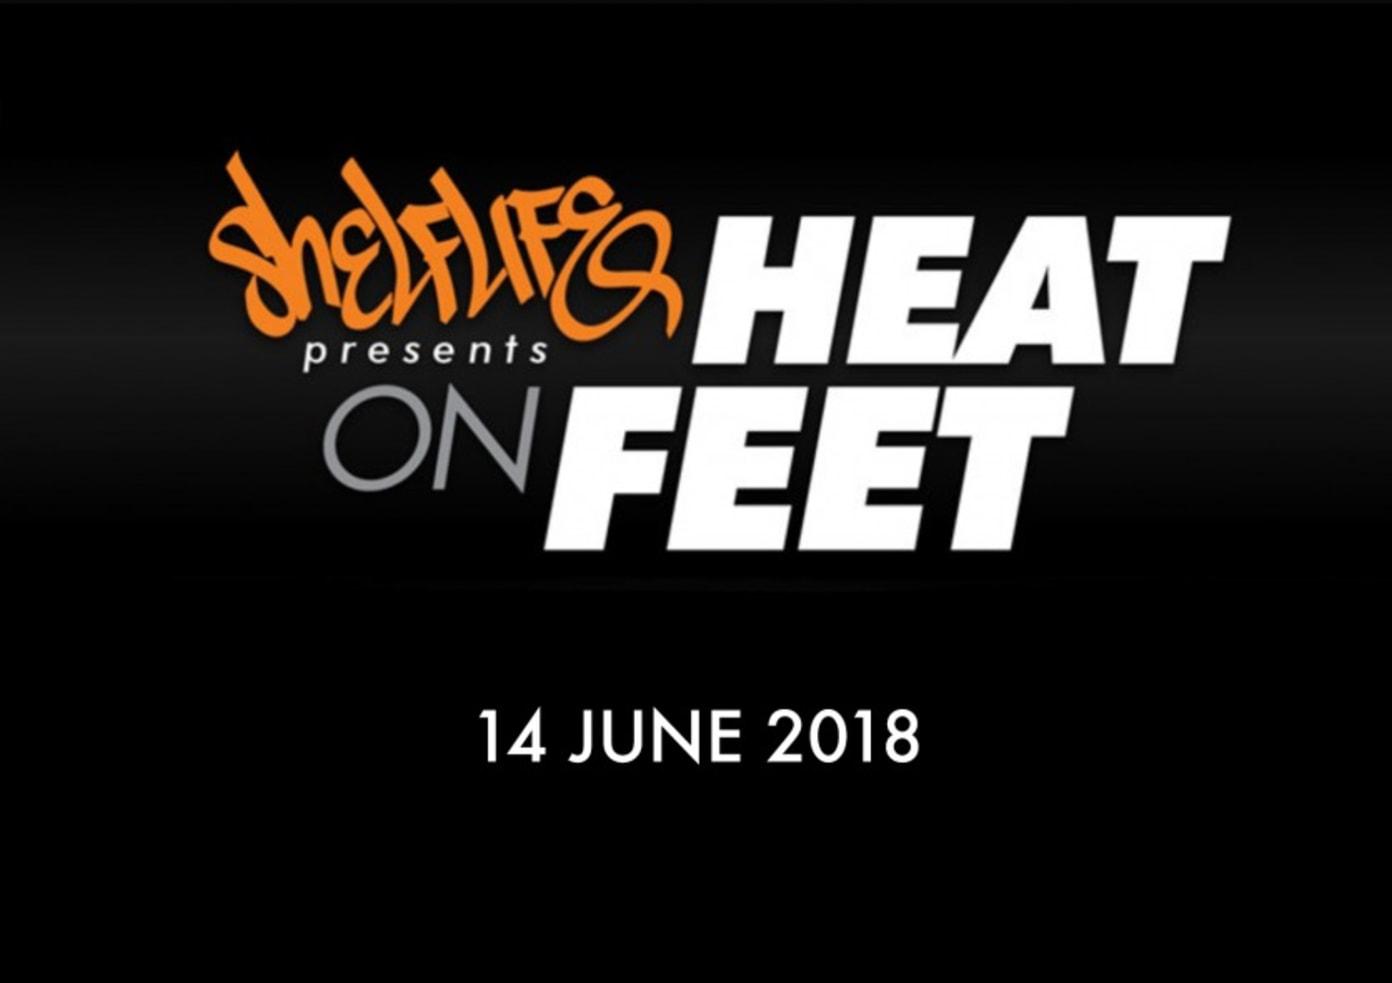 #SLHEAT: 14 June 2018